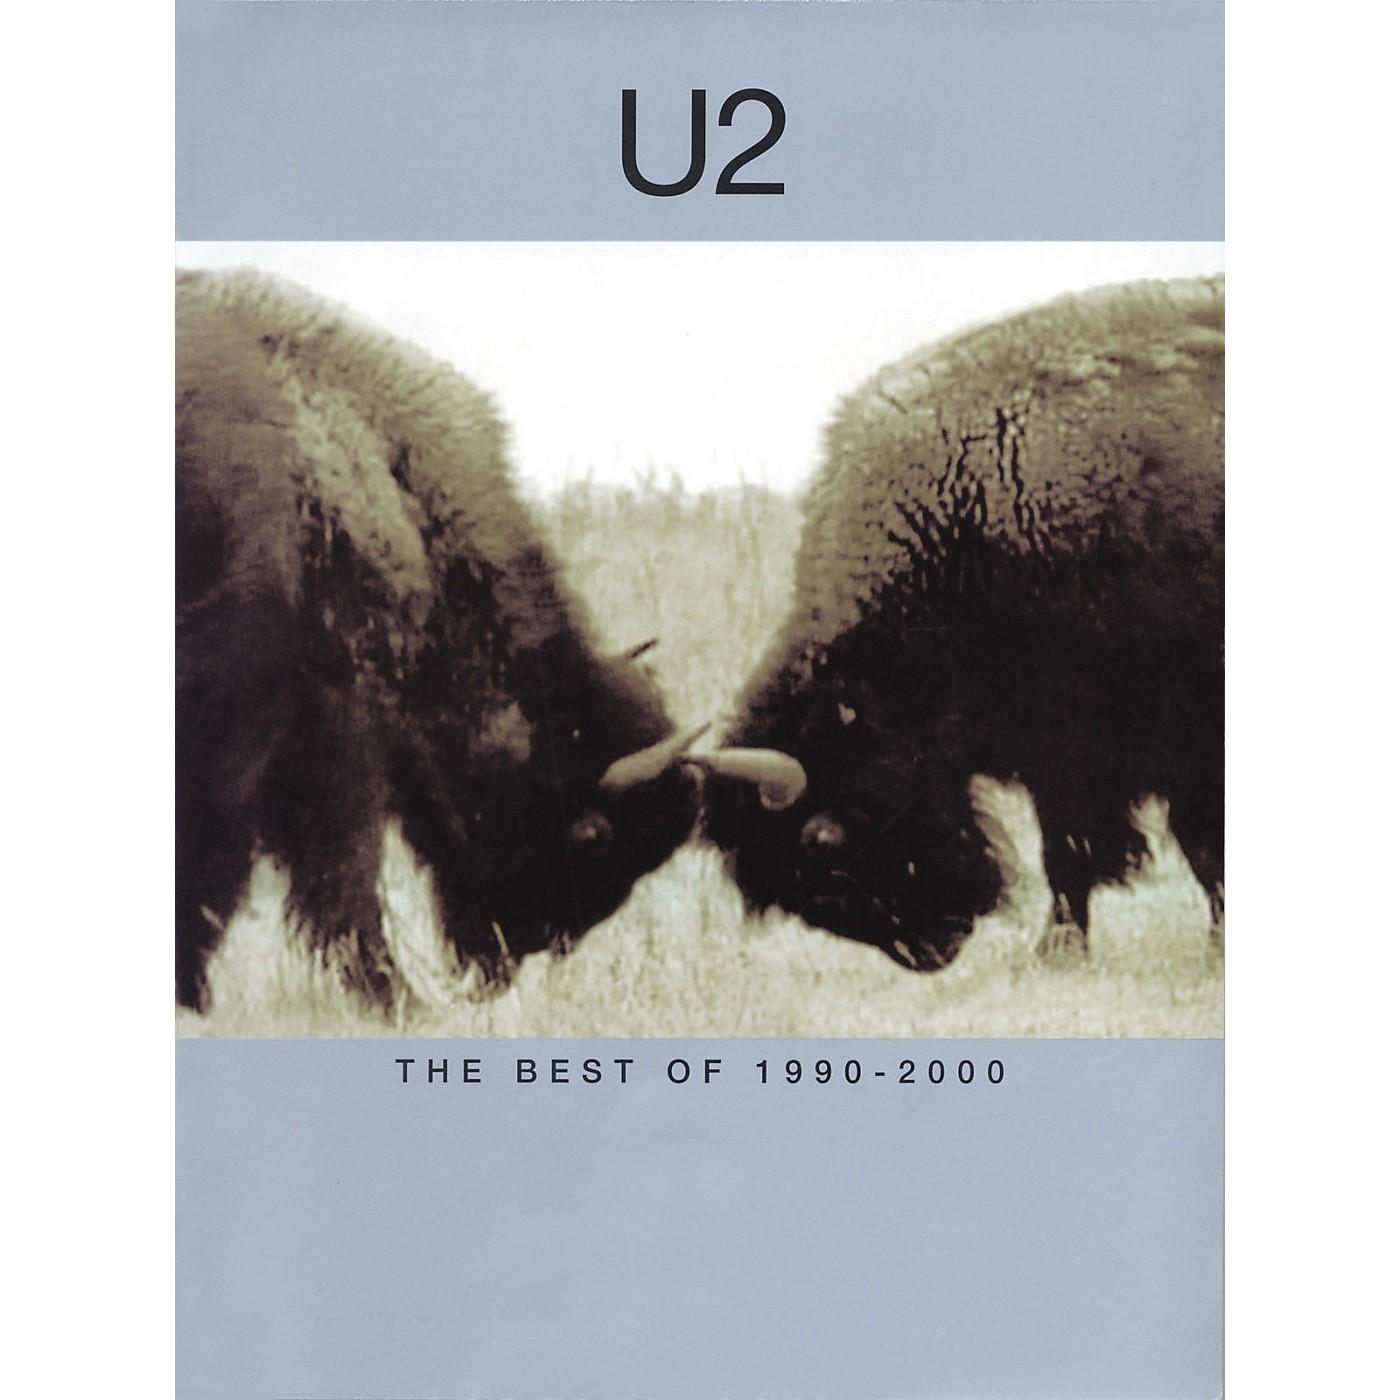 Hal Leonard U2-Best of 1990-2000 Piano, Vocal, Guitar Songbook thumbnail